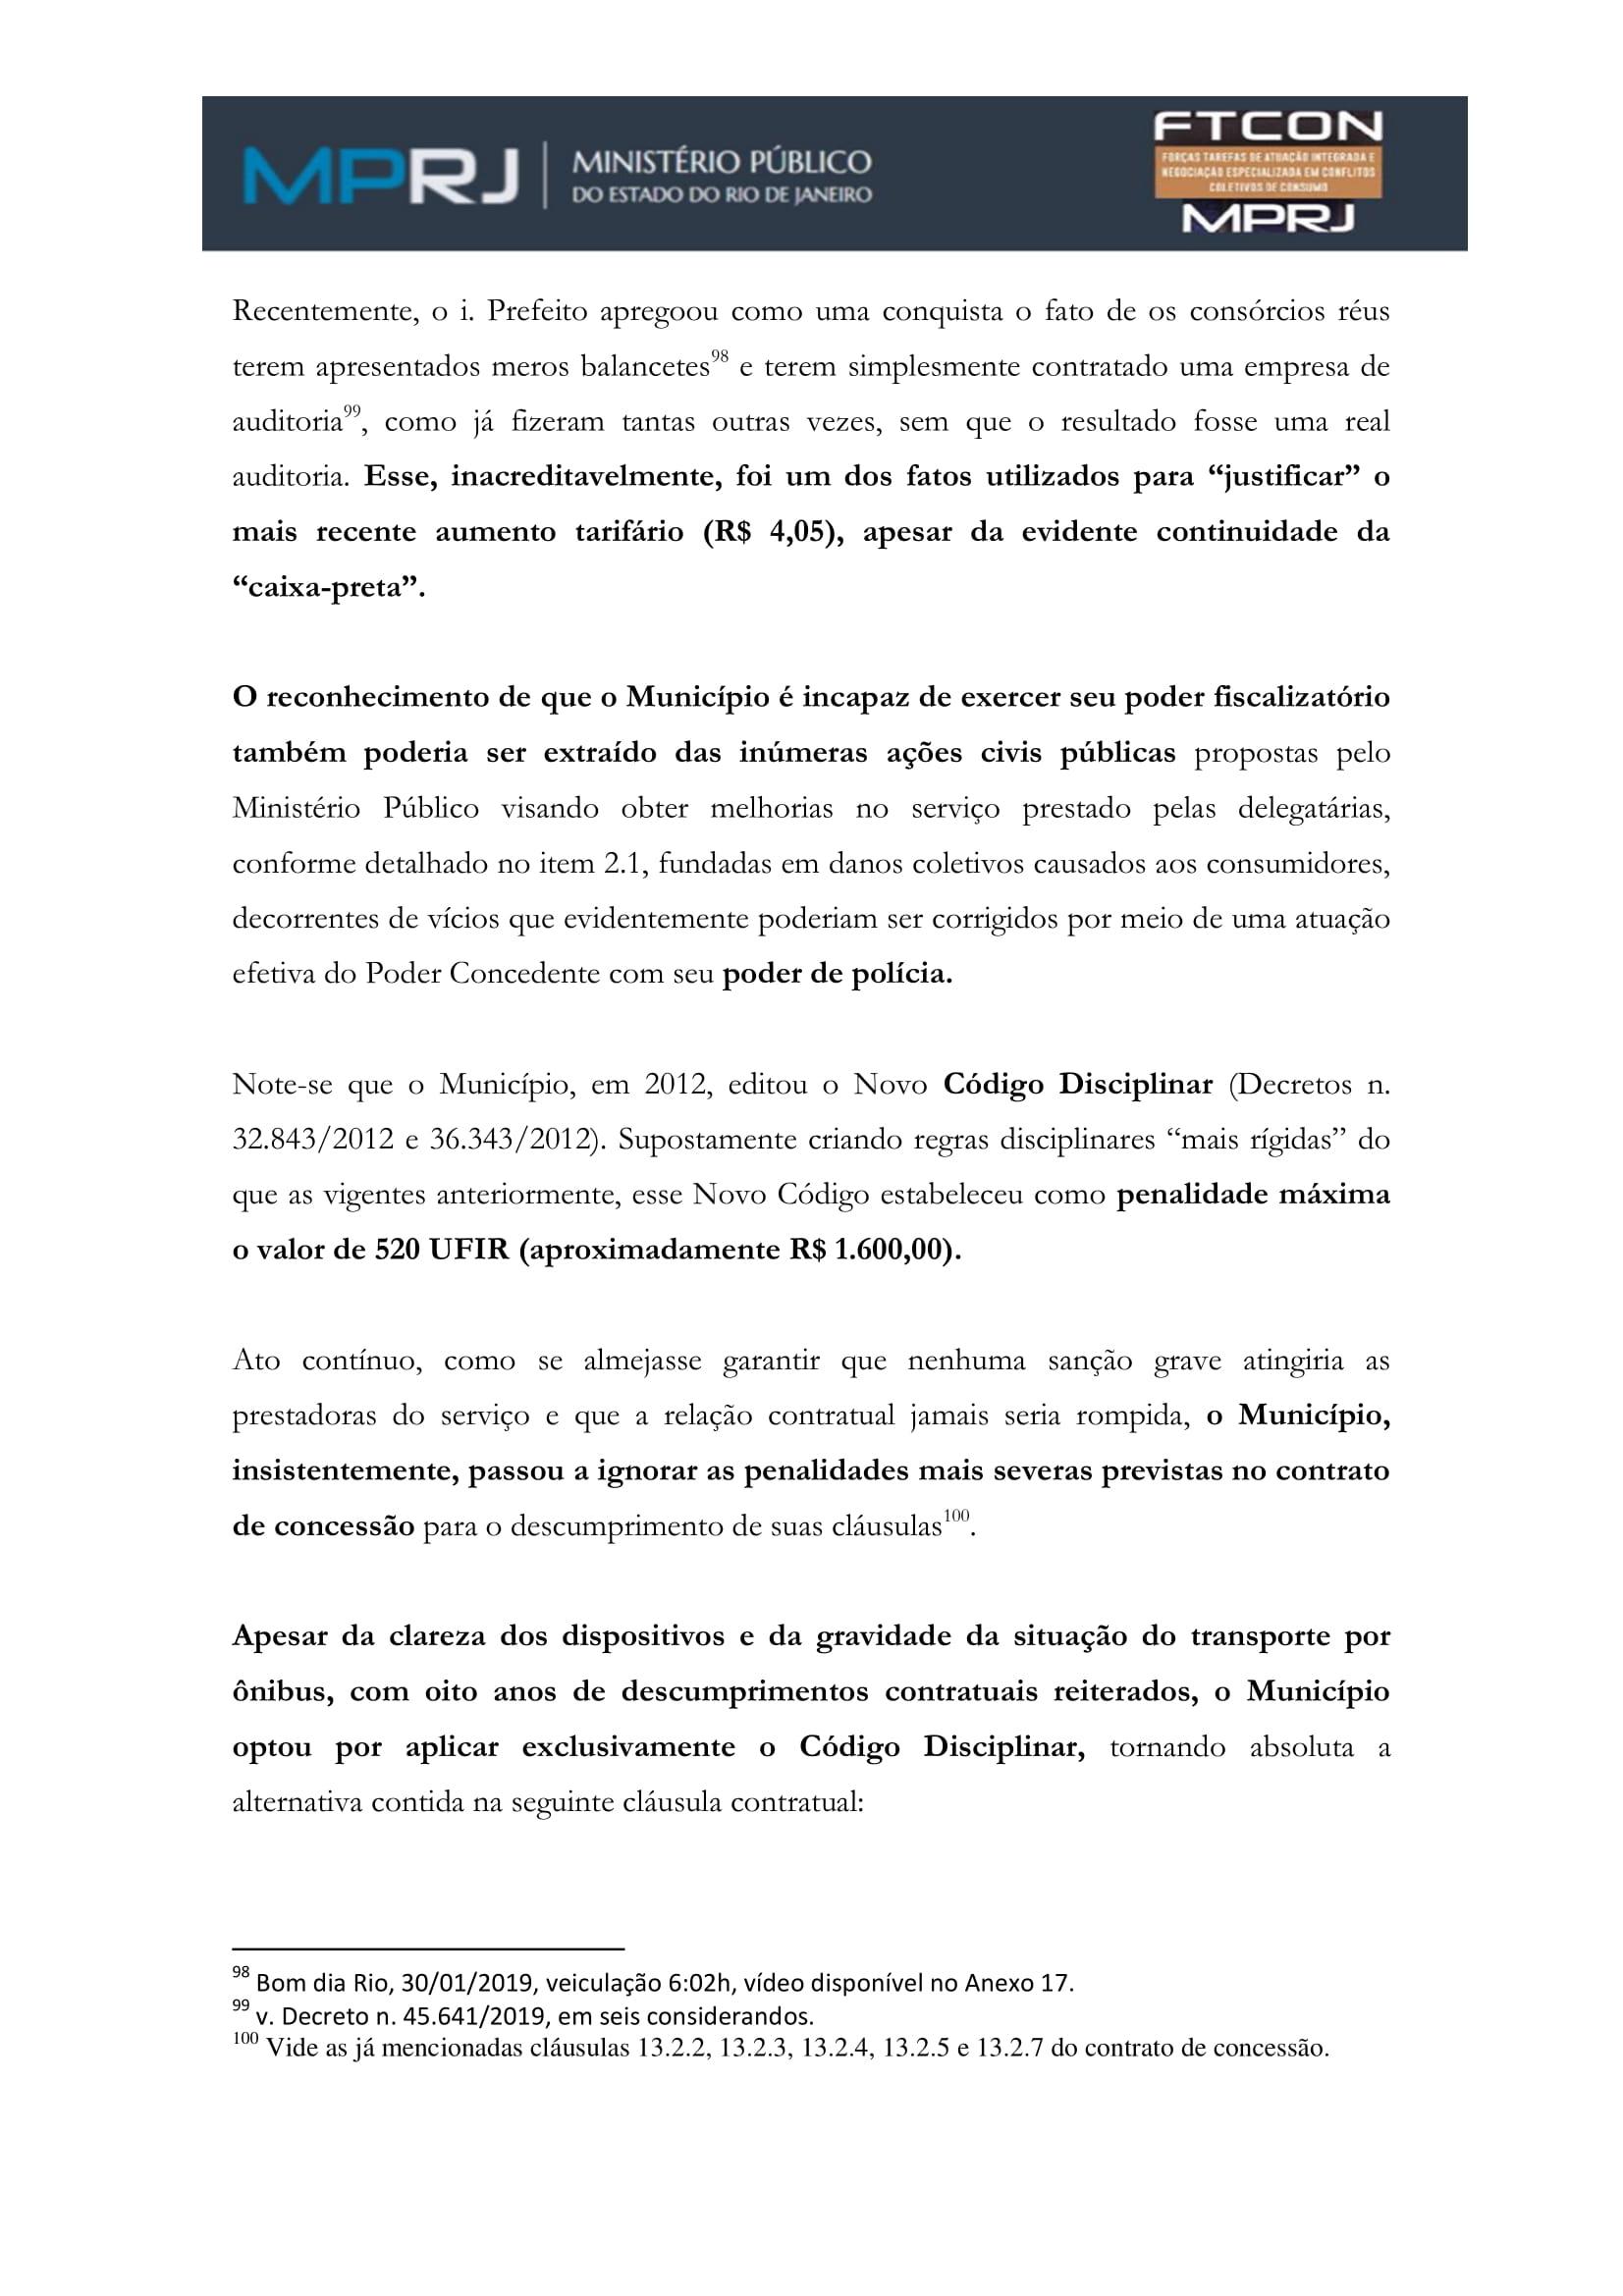 acp_caducidade_onibus_dr_rt-108